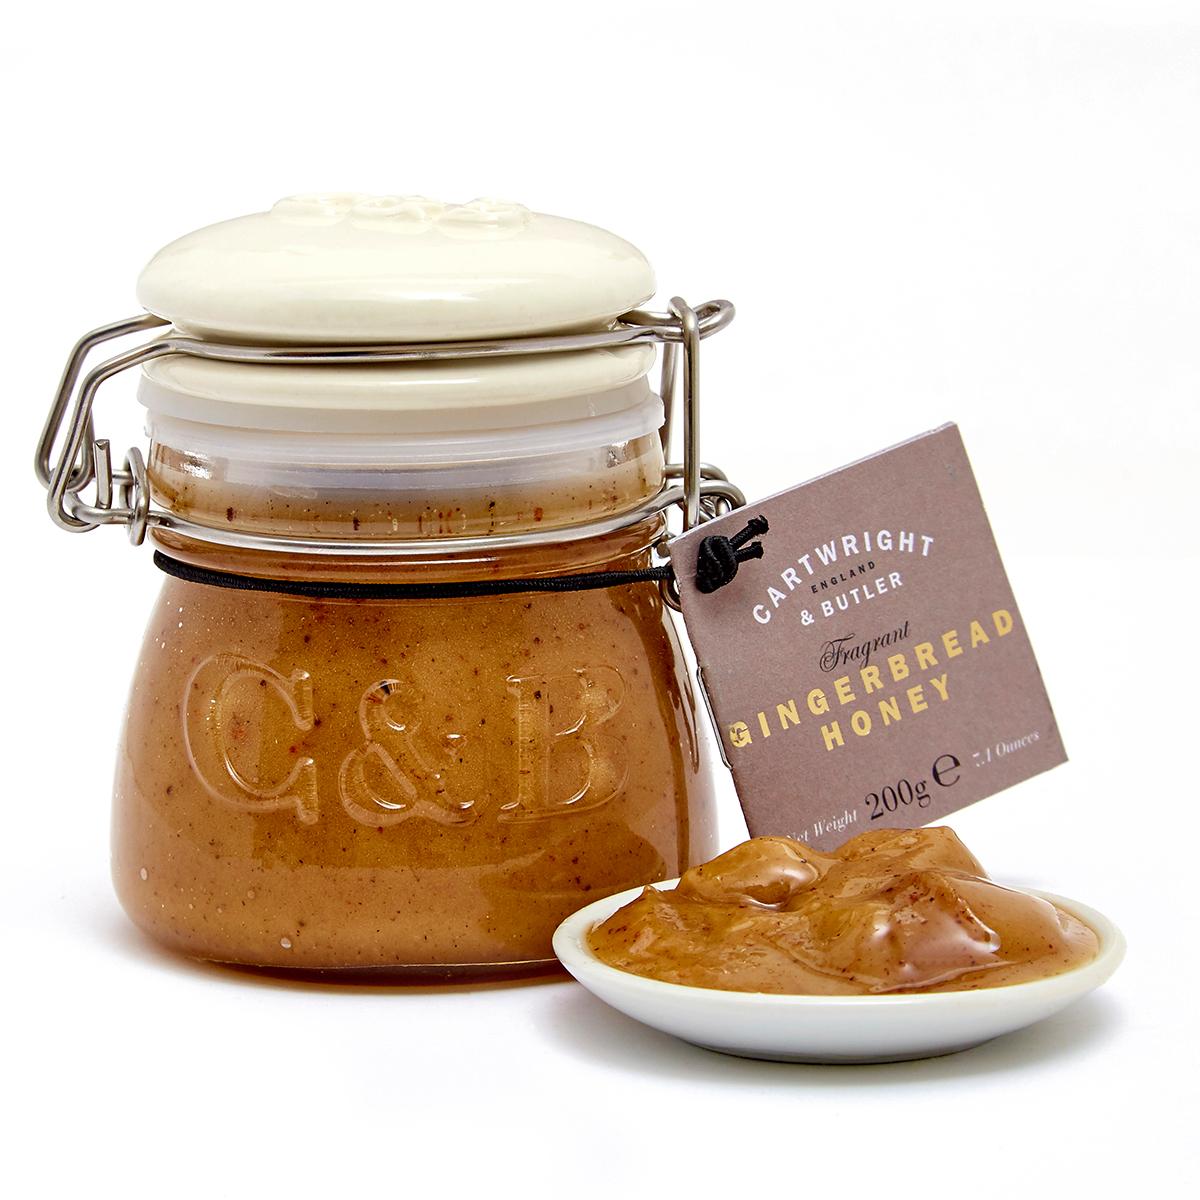 Gingerbread honey